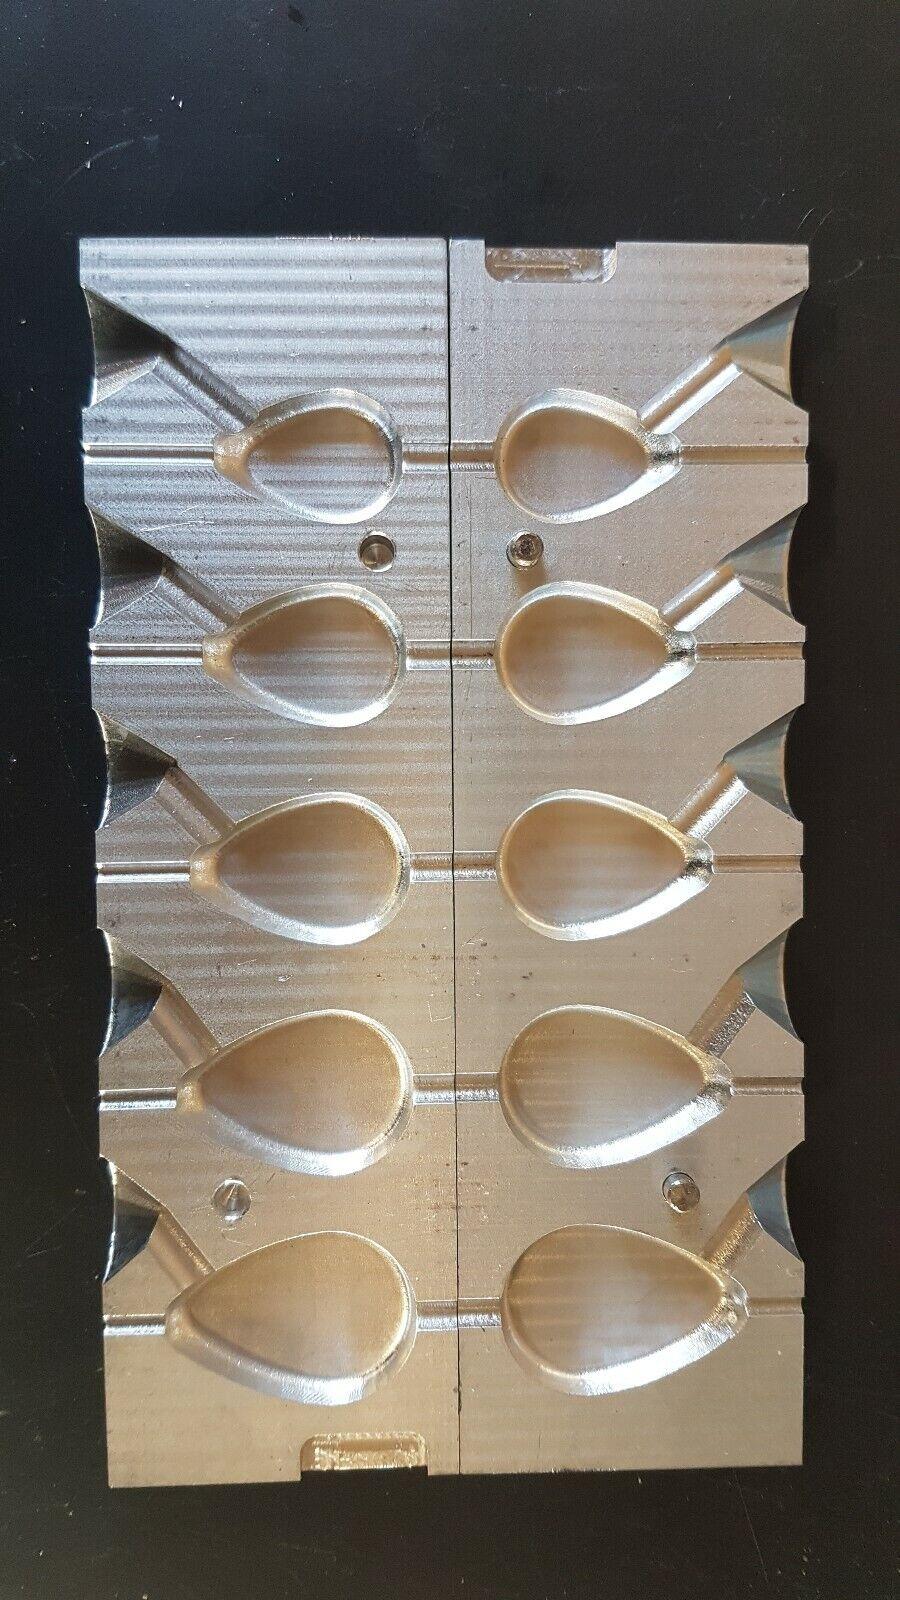 Fishing Lead Mould Flat  Pear Inline Mould 2oz 2.5oz 3oz 3.5oz 4oz  online sale